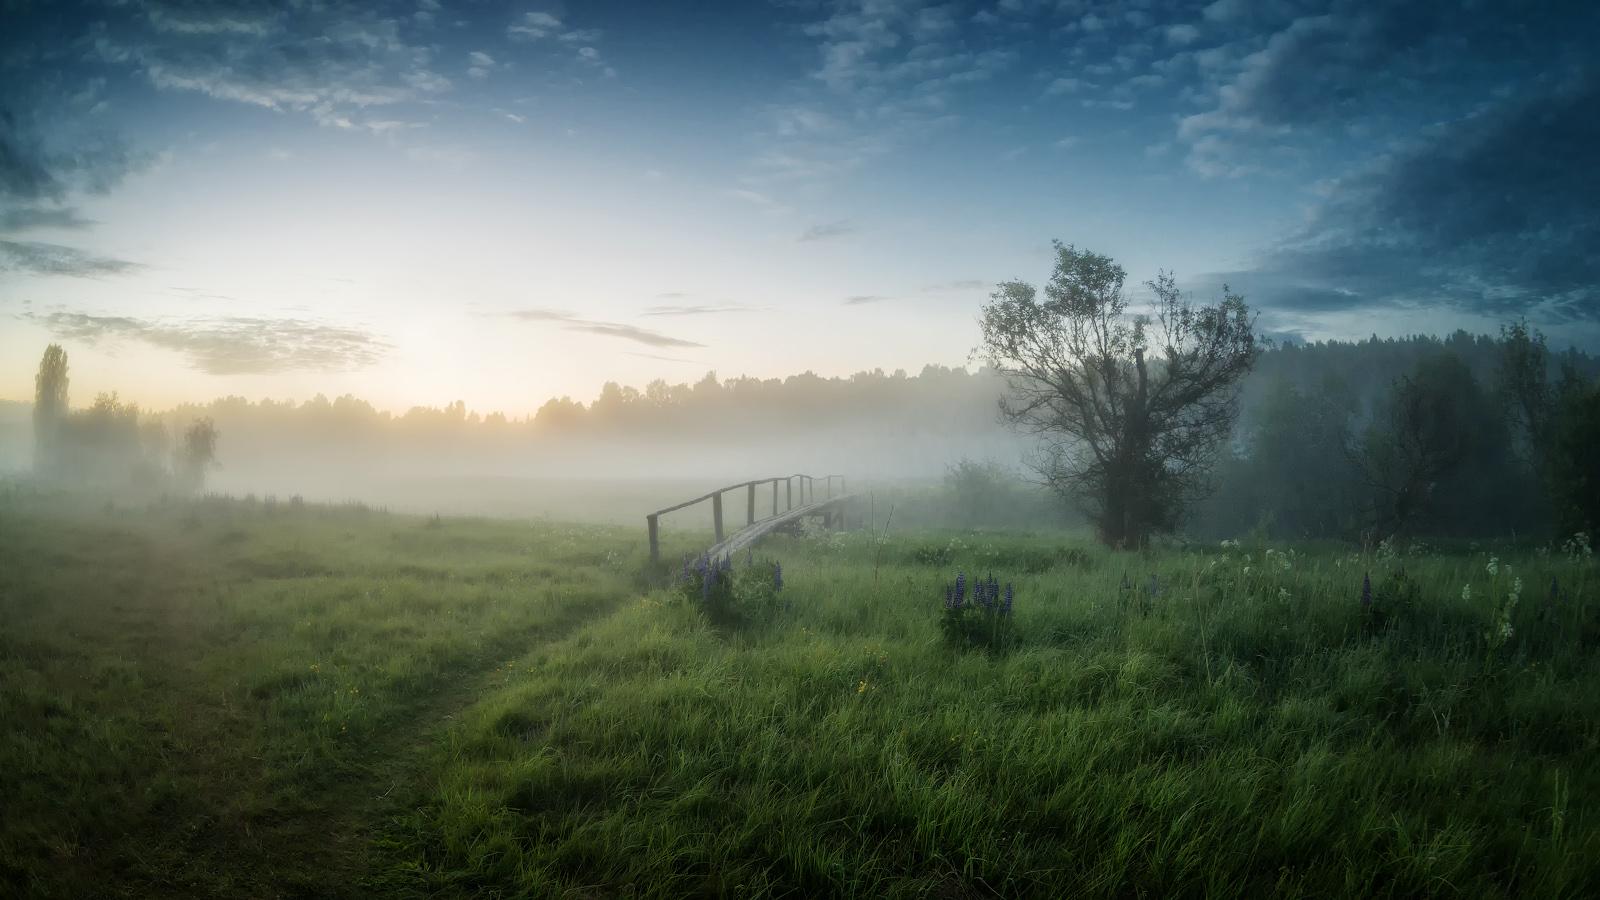 лето, июнь, утропо тропинке в туман